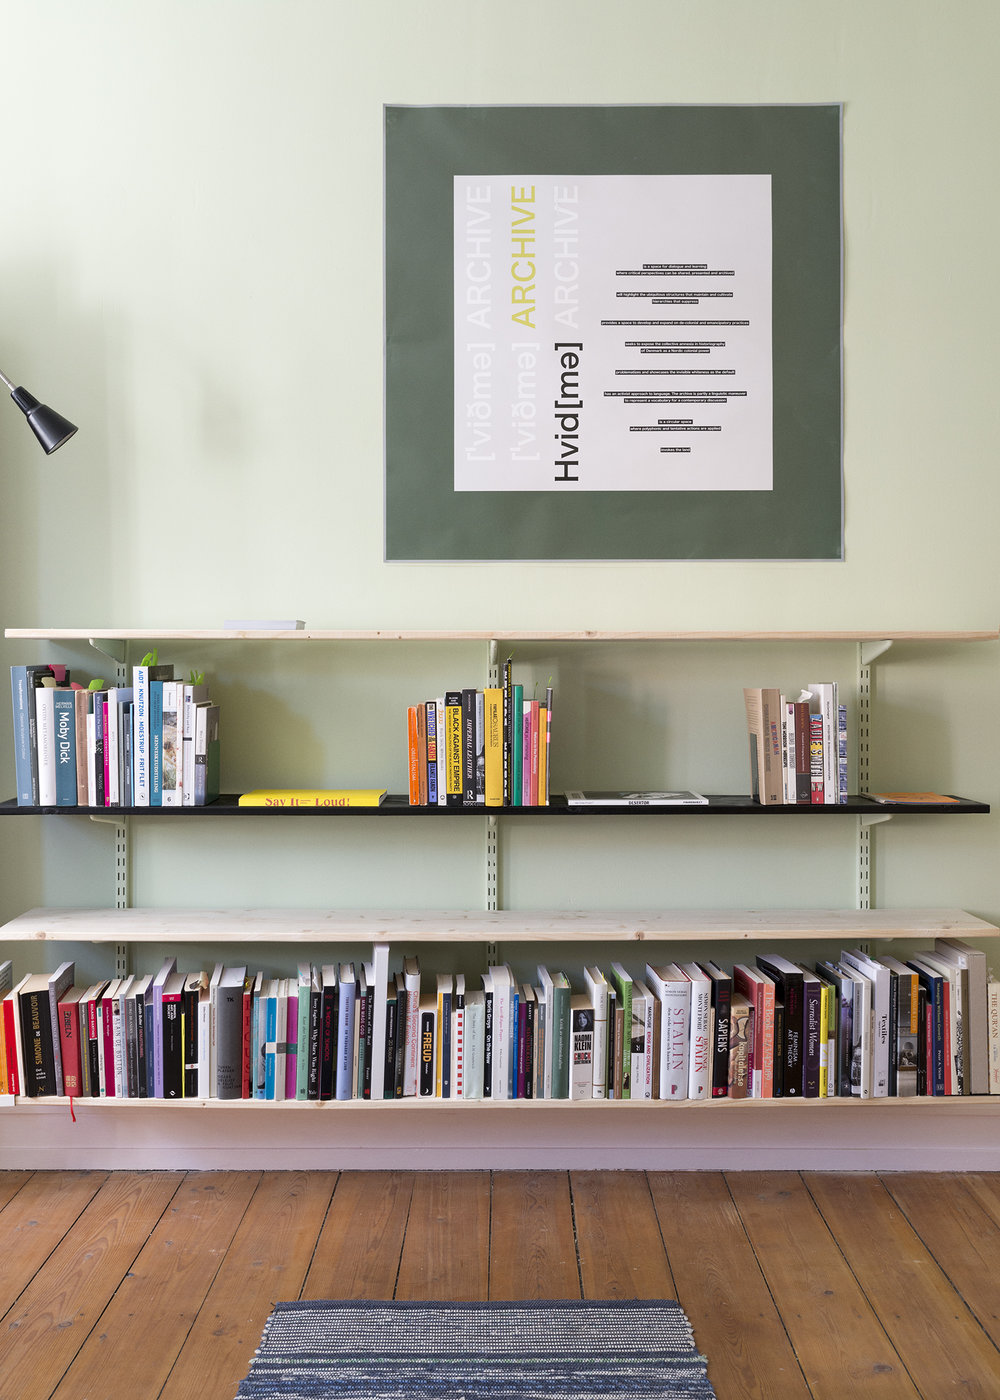 Hvid[mə] Archive (Annarosa Krøyer Holm and Miriam Haile)-Library on critical whiteness study and decolonial perspectives Poster: Manifesto,Postkort A5 :[ˈviðmə]                                                     On floor: Kvist Trasmatta (Kvist Rag Rug), (2016), Helen Alskog